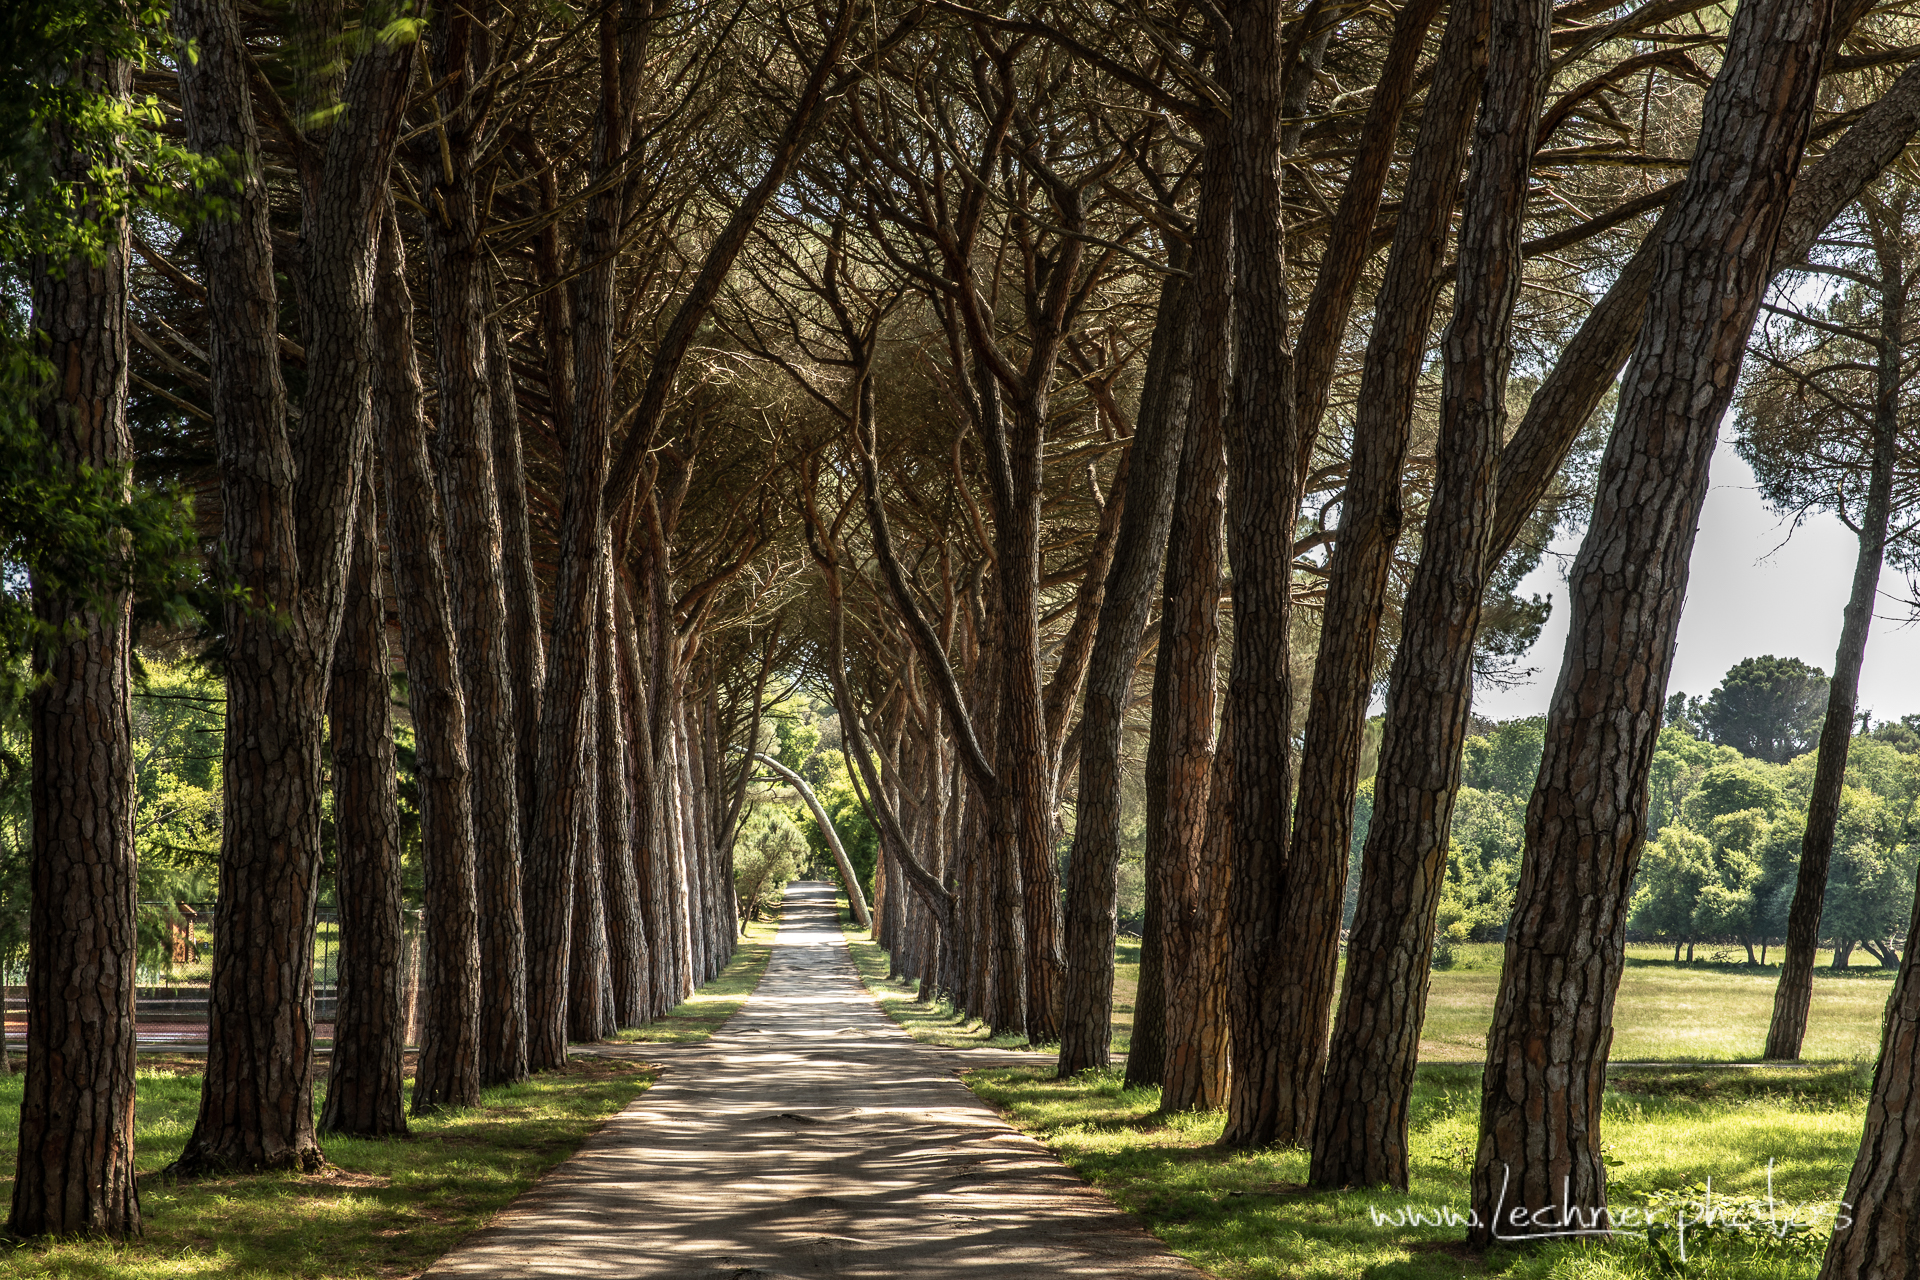 Pine alley at Brijuni National Park, Croatia